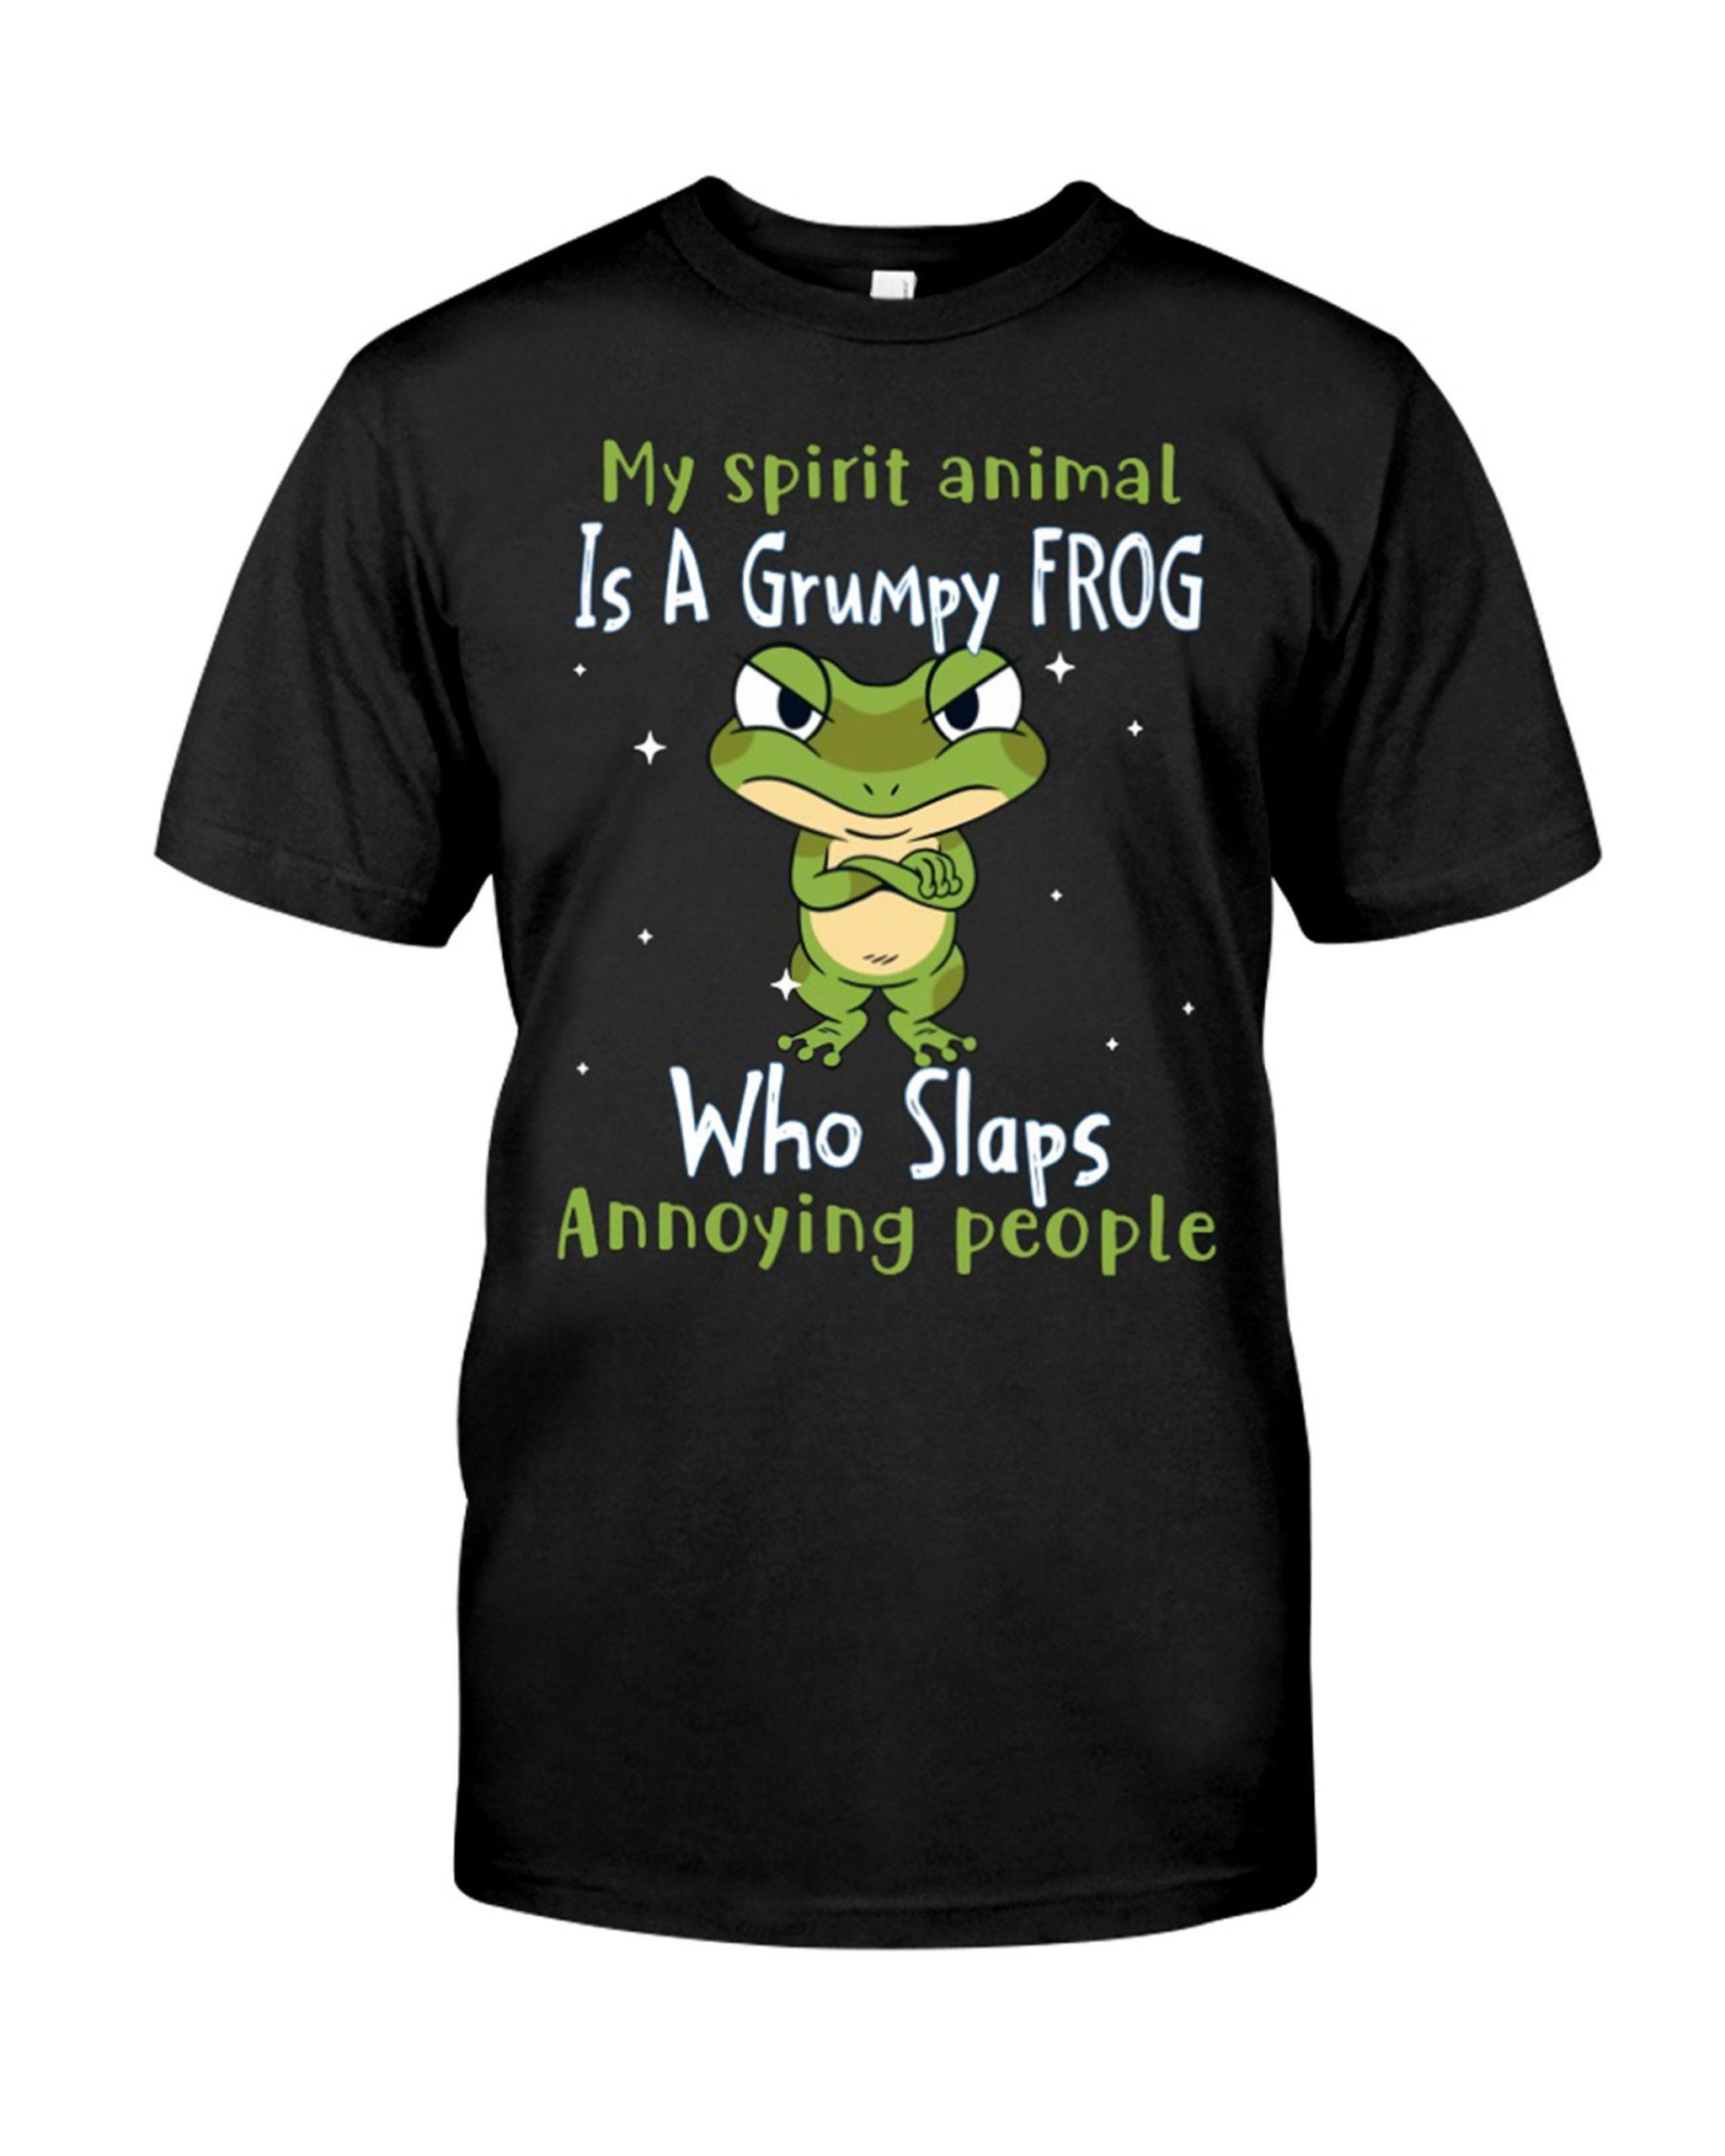 Frog My Spirit Animal Is A Grumpy Frog Who Slaps Annoying People Shirt 4